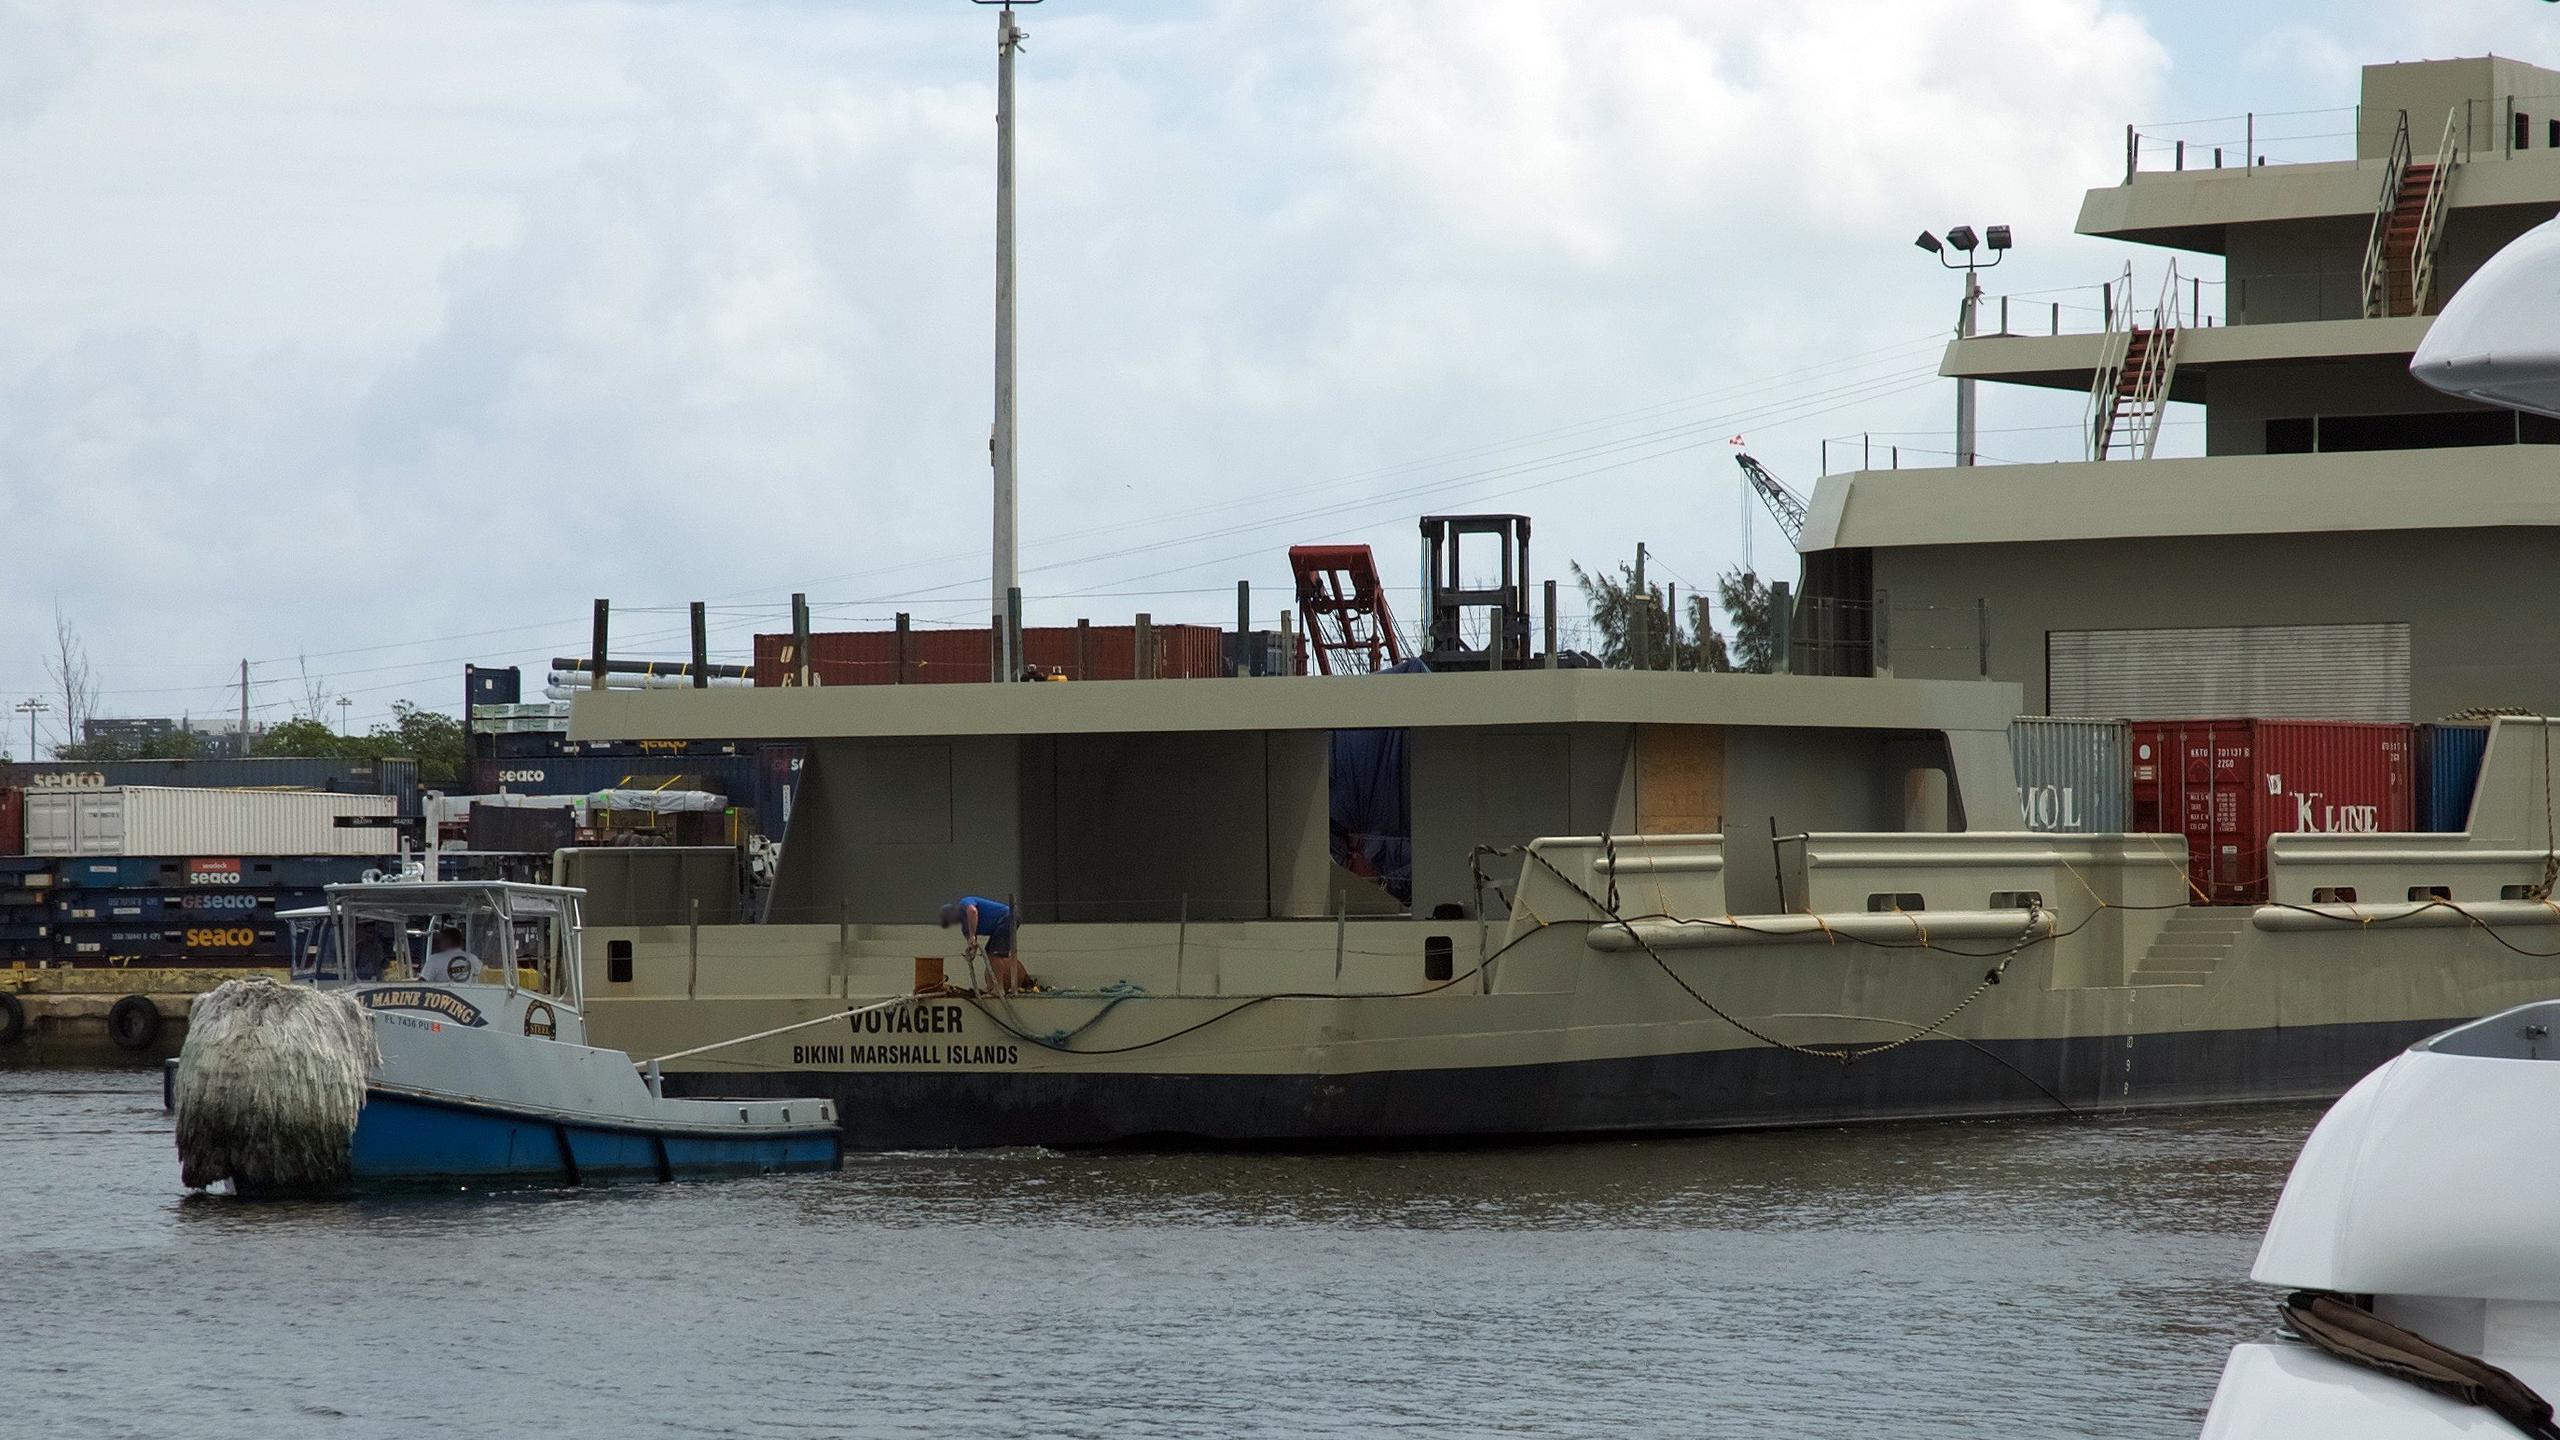 voyager-motoryacht-swiftships-1997-78m-stern